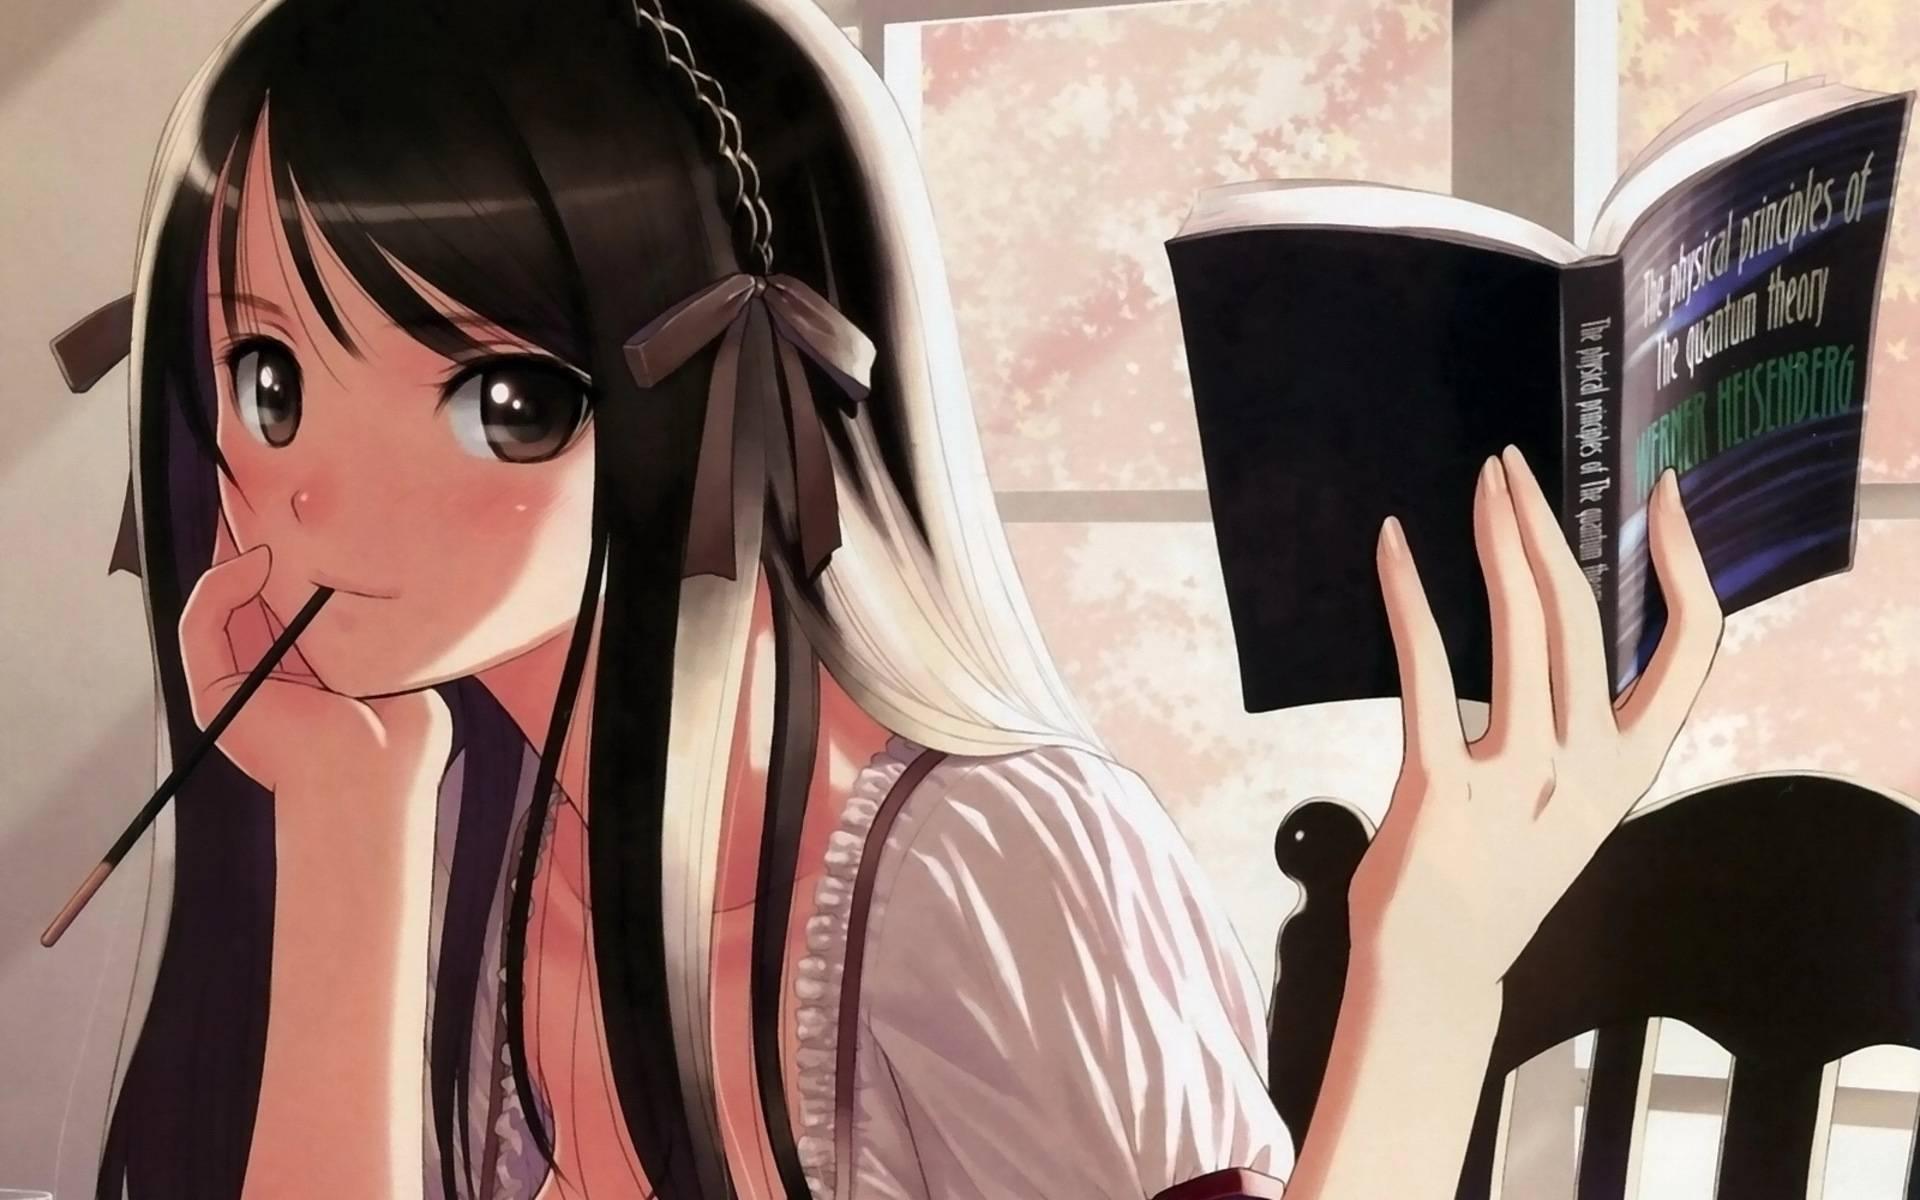 anime anime manga images pictures anime girl studying wallpaper tweet 1920x1200